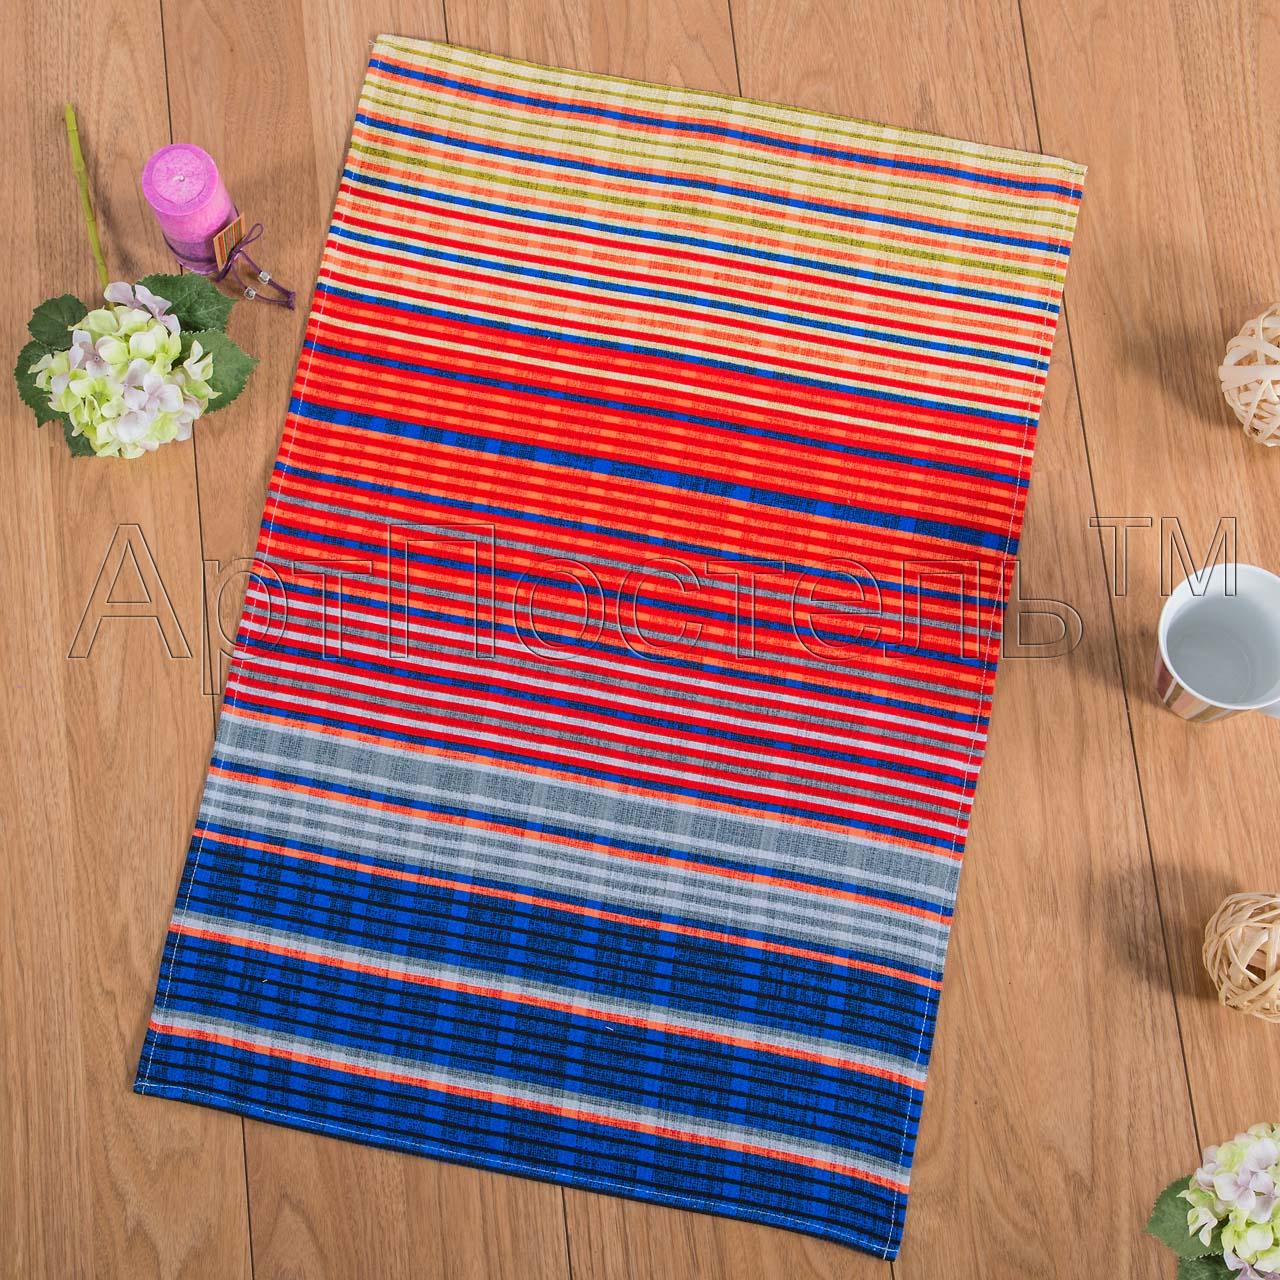 Вафельное полотенце Рябушка Оранжевый р. 80х150Вафельные полотенца<br>Плотность: 160 г/кв. м<br><br>Тип: Вафельное полотенце<br>Размер: 80х150<br>Материал: Вафельное полотно